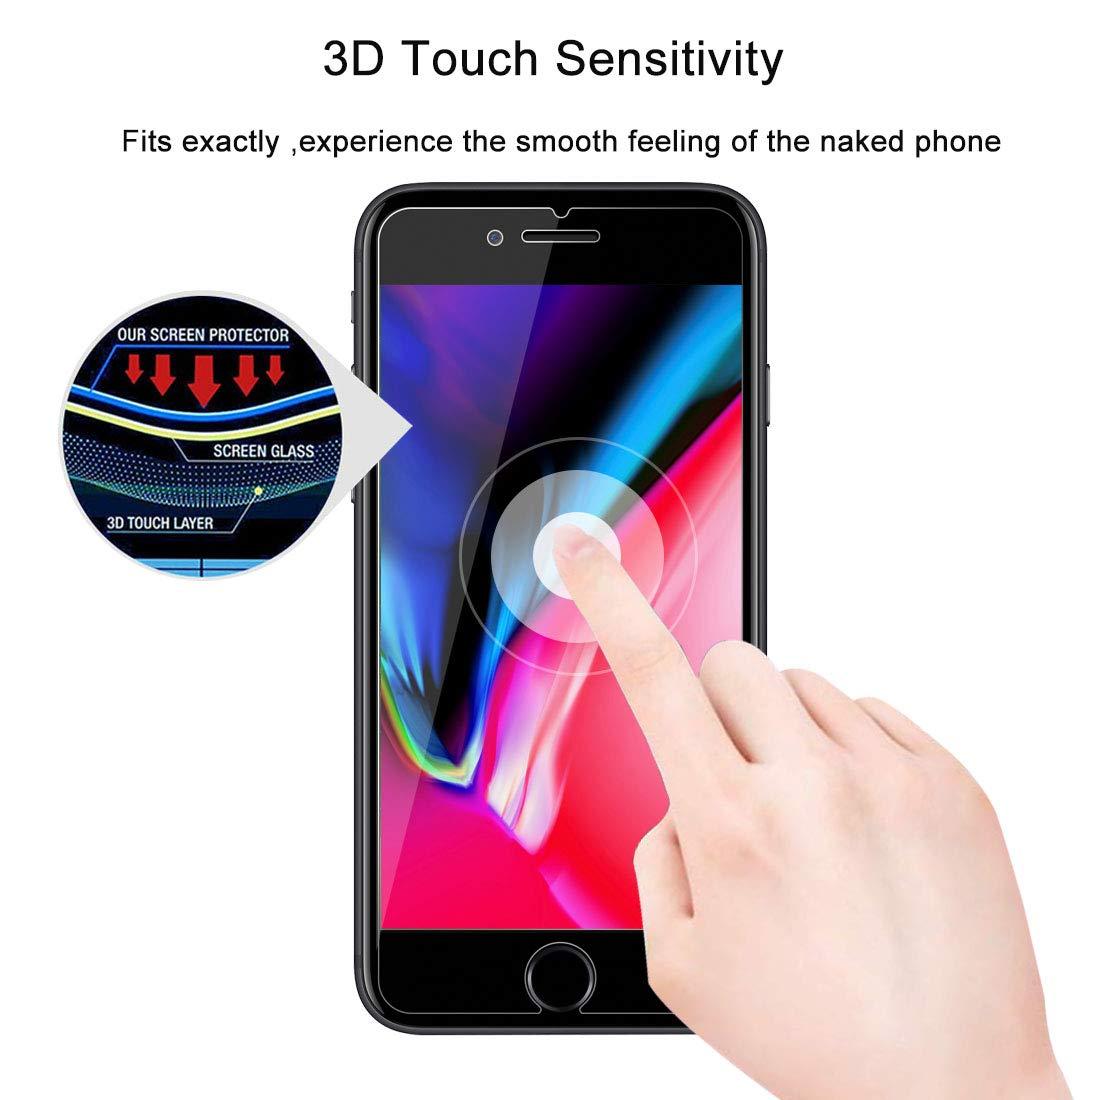 Protector de Pantalla para iPhone 11 // iPhone XR ,9H Dureza,Anti-Burbujas 2 Piezas Funda Compatible,Anti-despegamientos,Anti-ara/ñazos,Alta Transparencia Cristal Templado para iPhone 11// iPhone XR